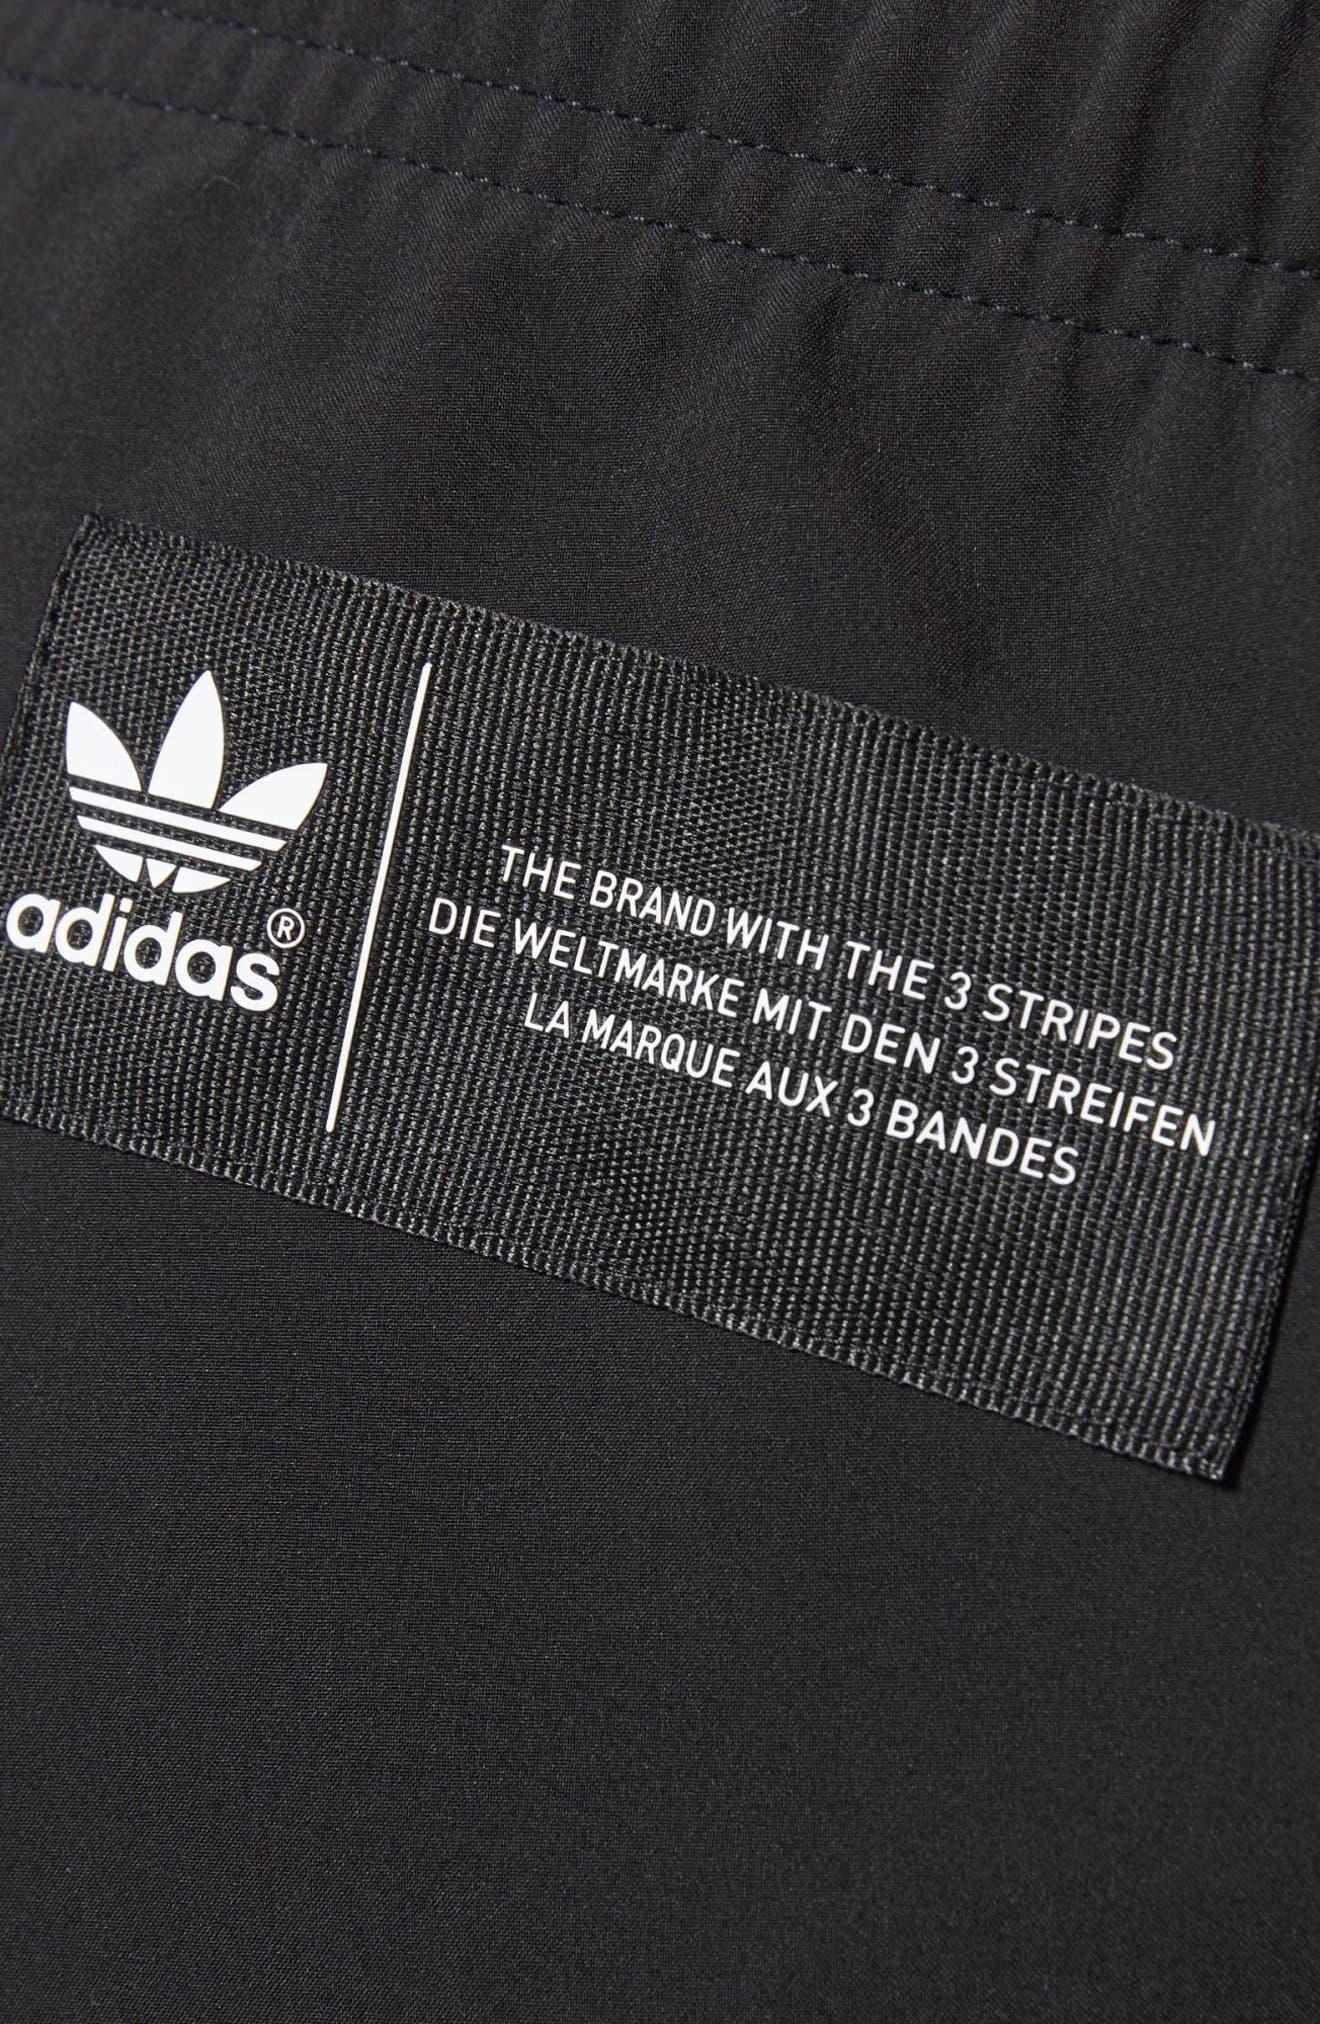 Originals CR8 Hybrid Pants,                             Alternate thumbnail 4, color,                             Black